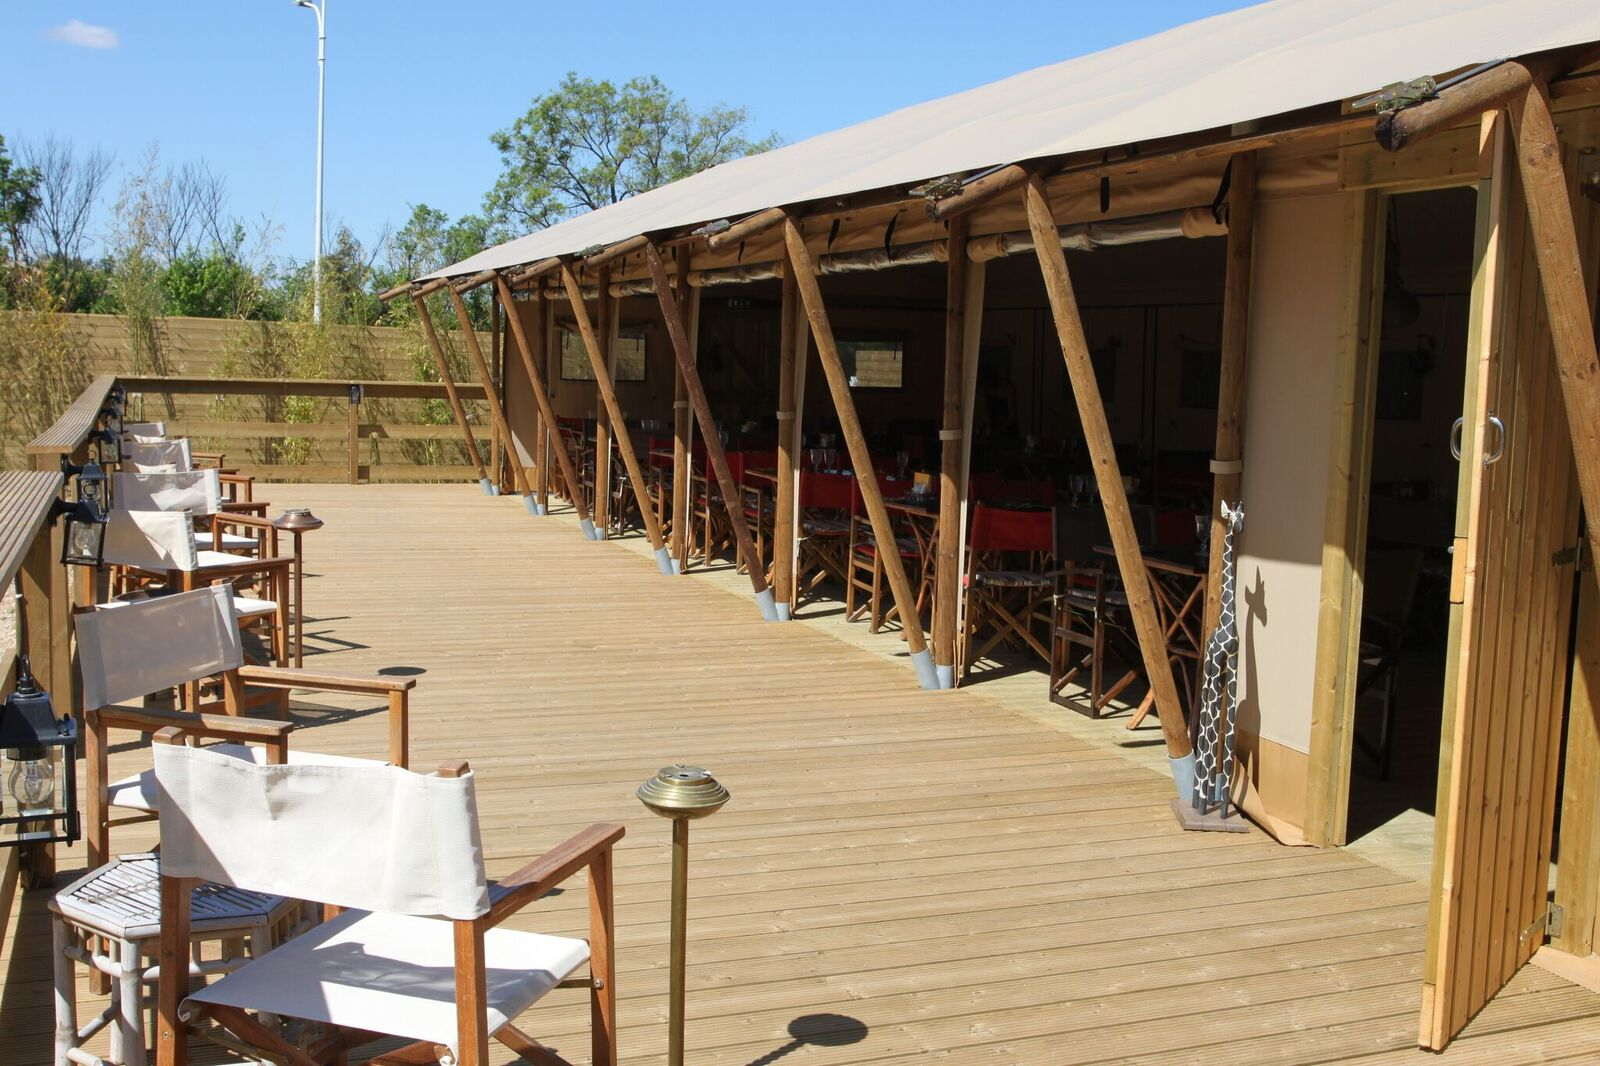 Restaurant tent verandah